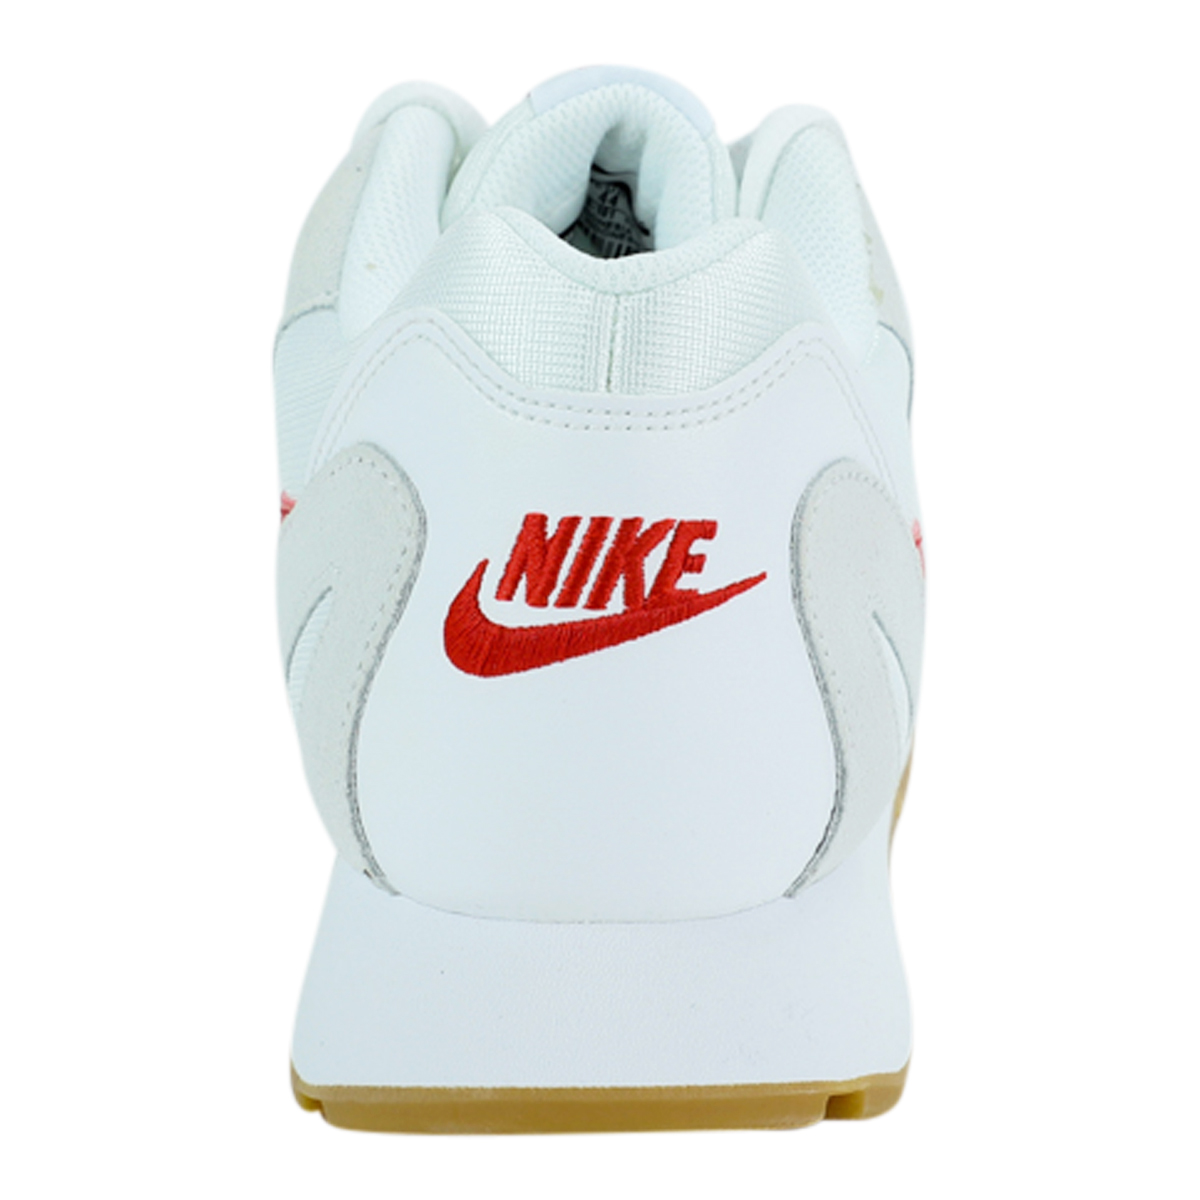 Nike-Men-039-s-Delfine-Running-Shoes thumbnail 20